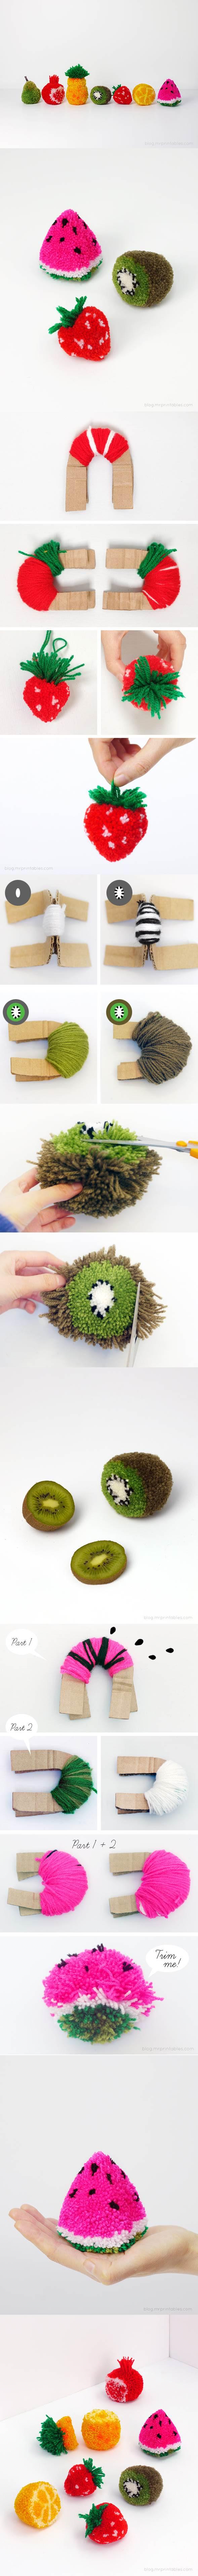 DIY Fruit Pom Poms 2